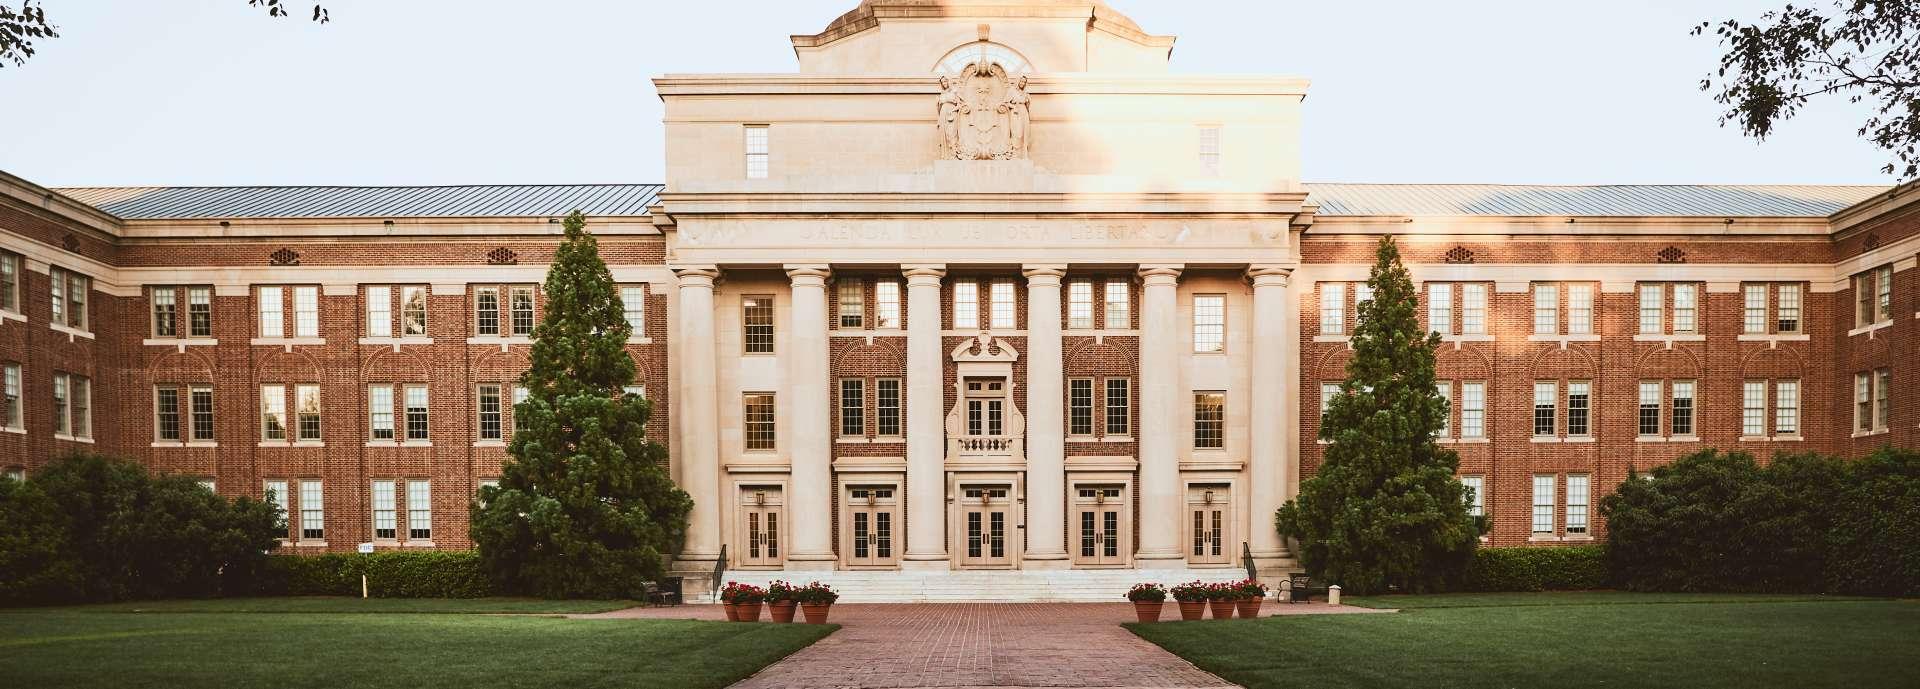 Davidson College | Universities in Lake Norman & College Sports